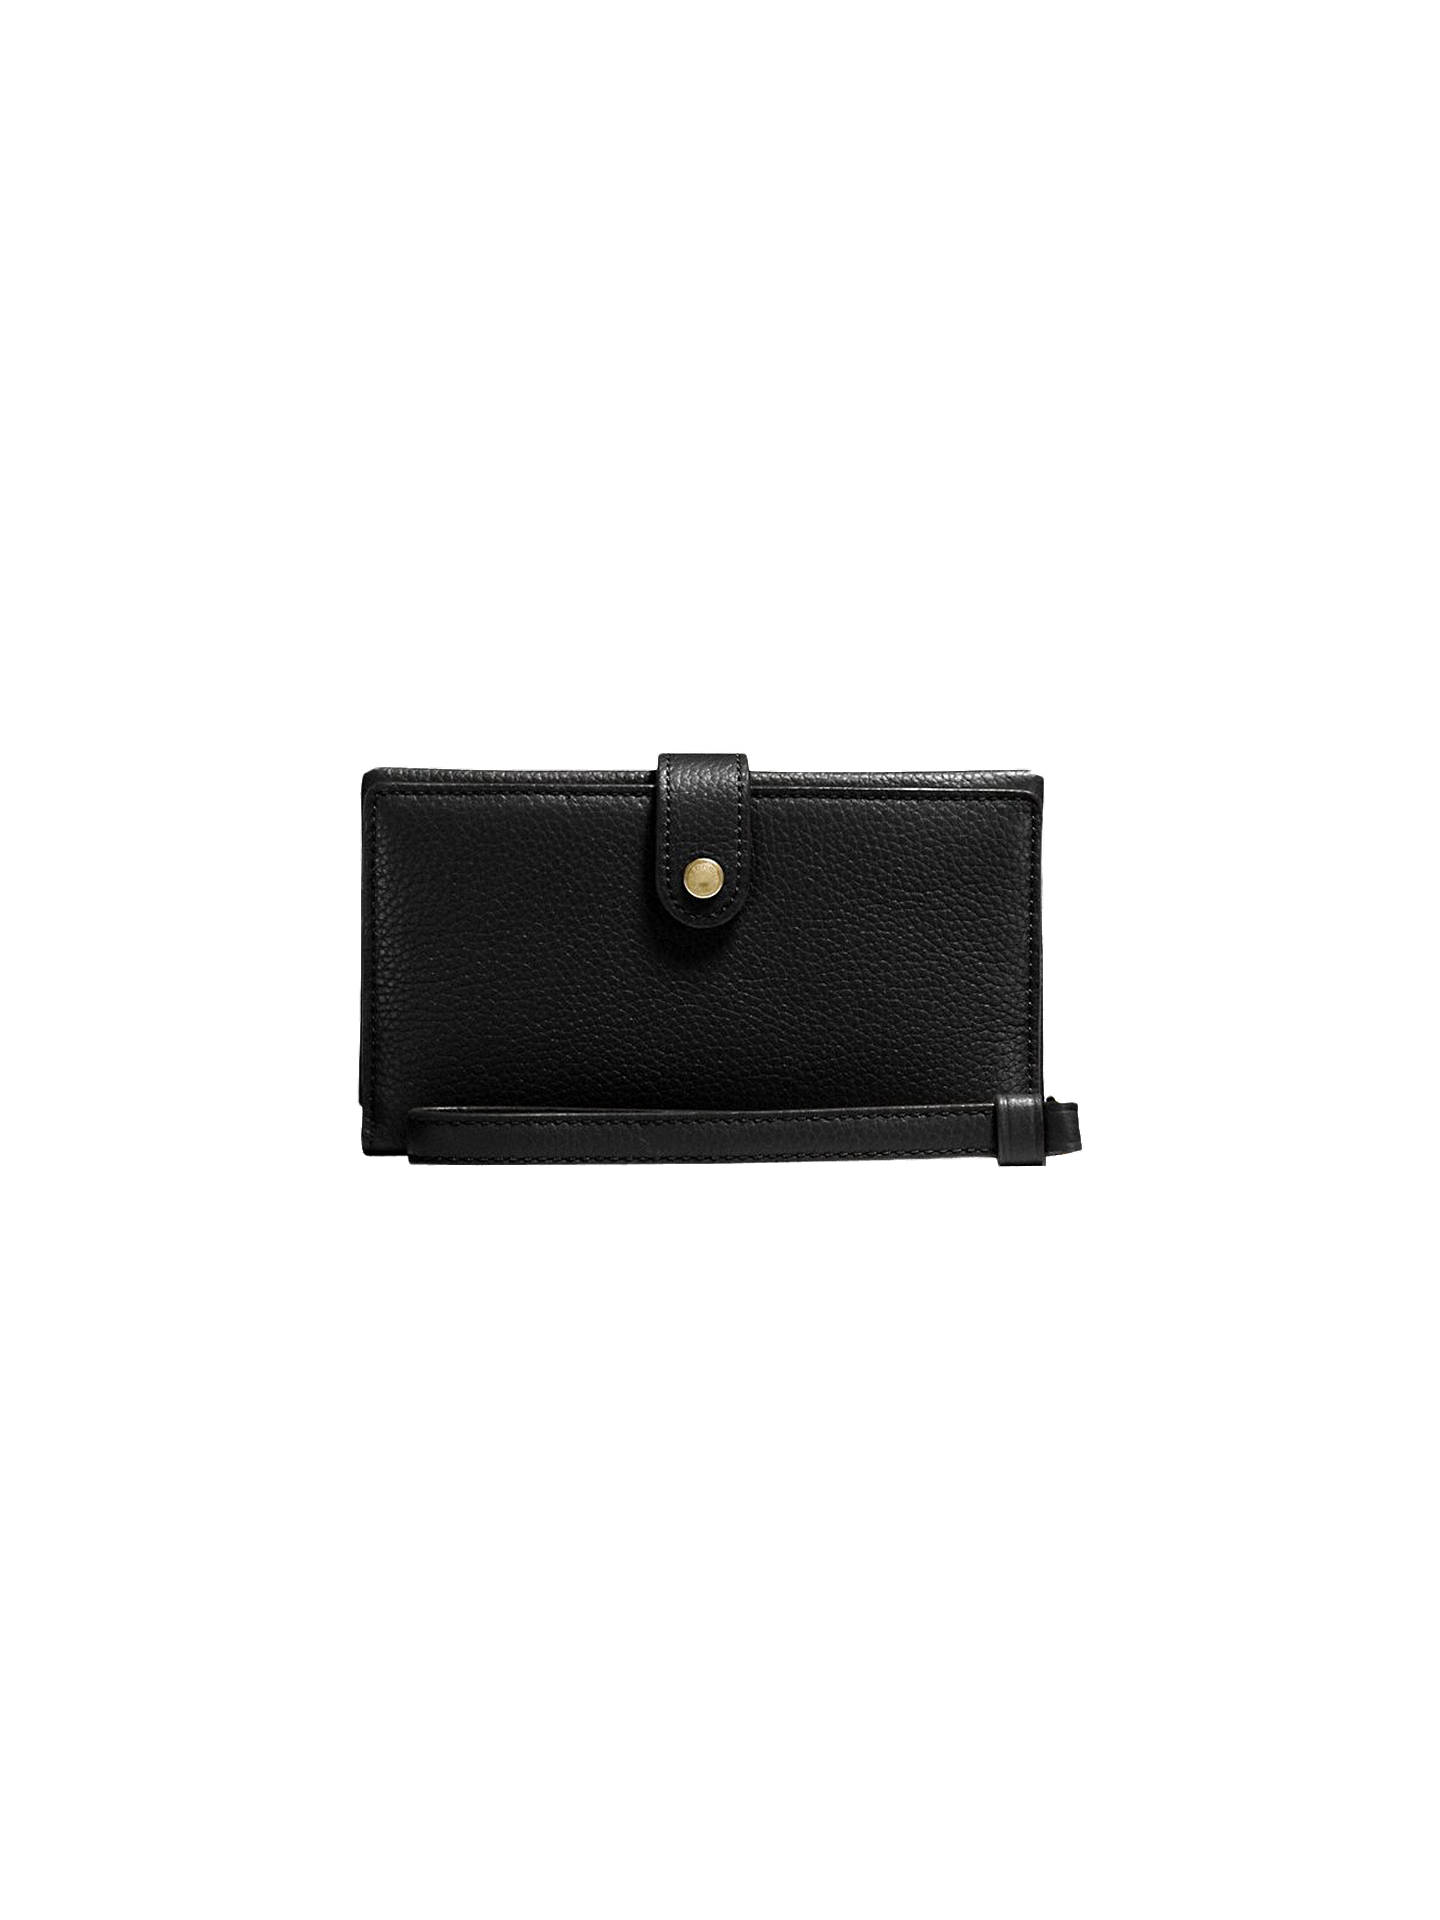 2941c1754162 shopping coach grey handbags purses wallets dillards 49df1 51587  australia  buycoach leather phone wristlet purse jet black online at johnlewis 434ae  8ddd2